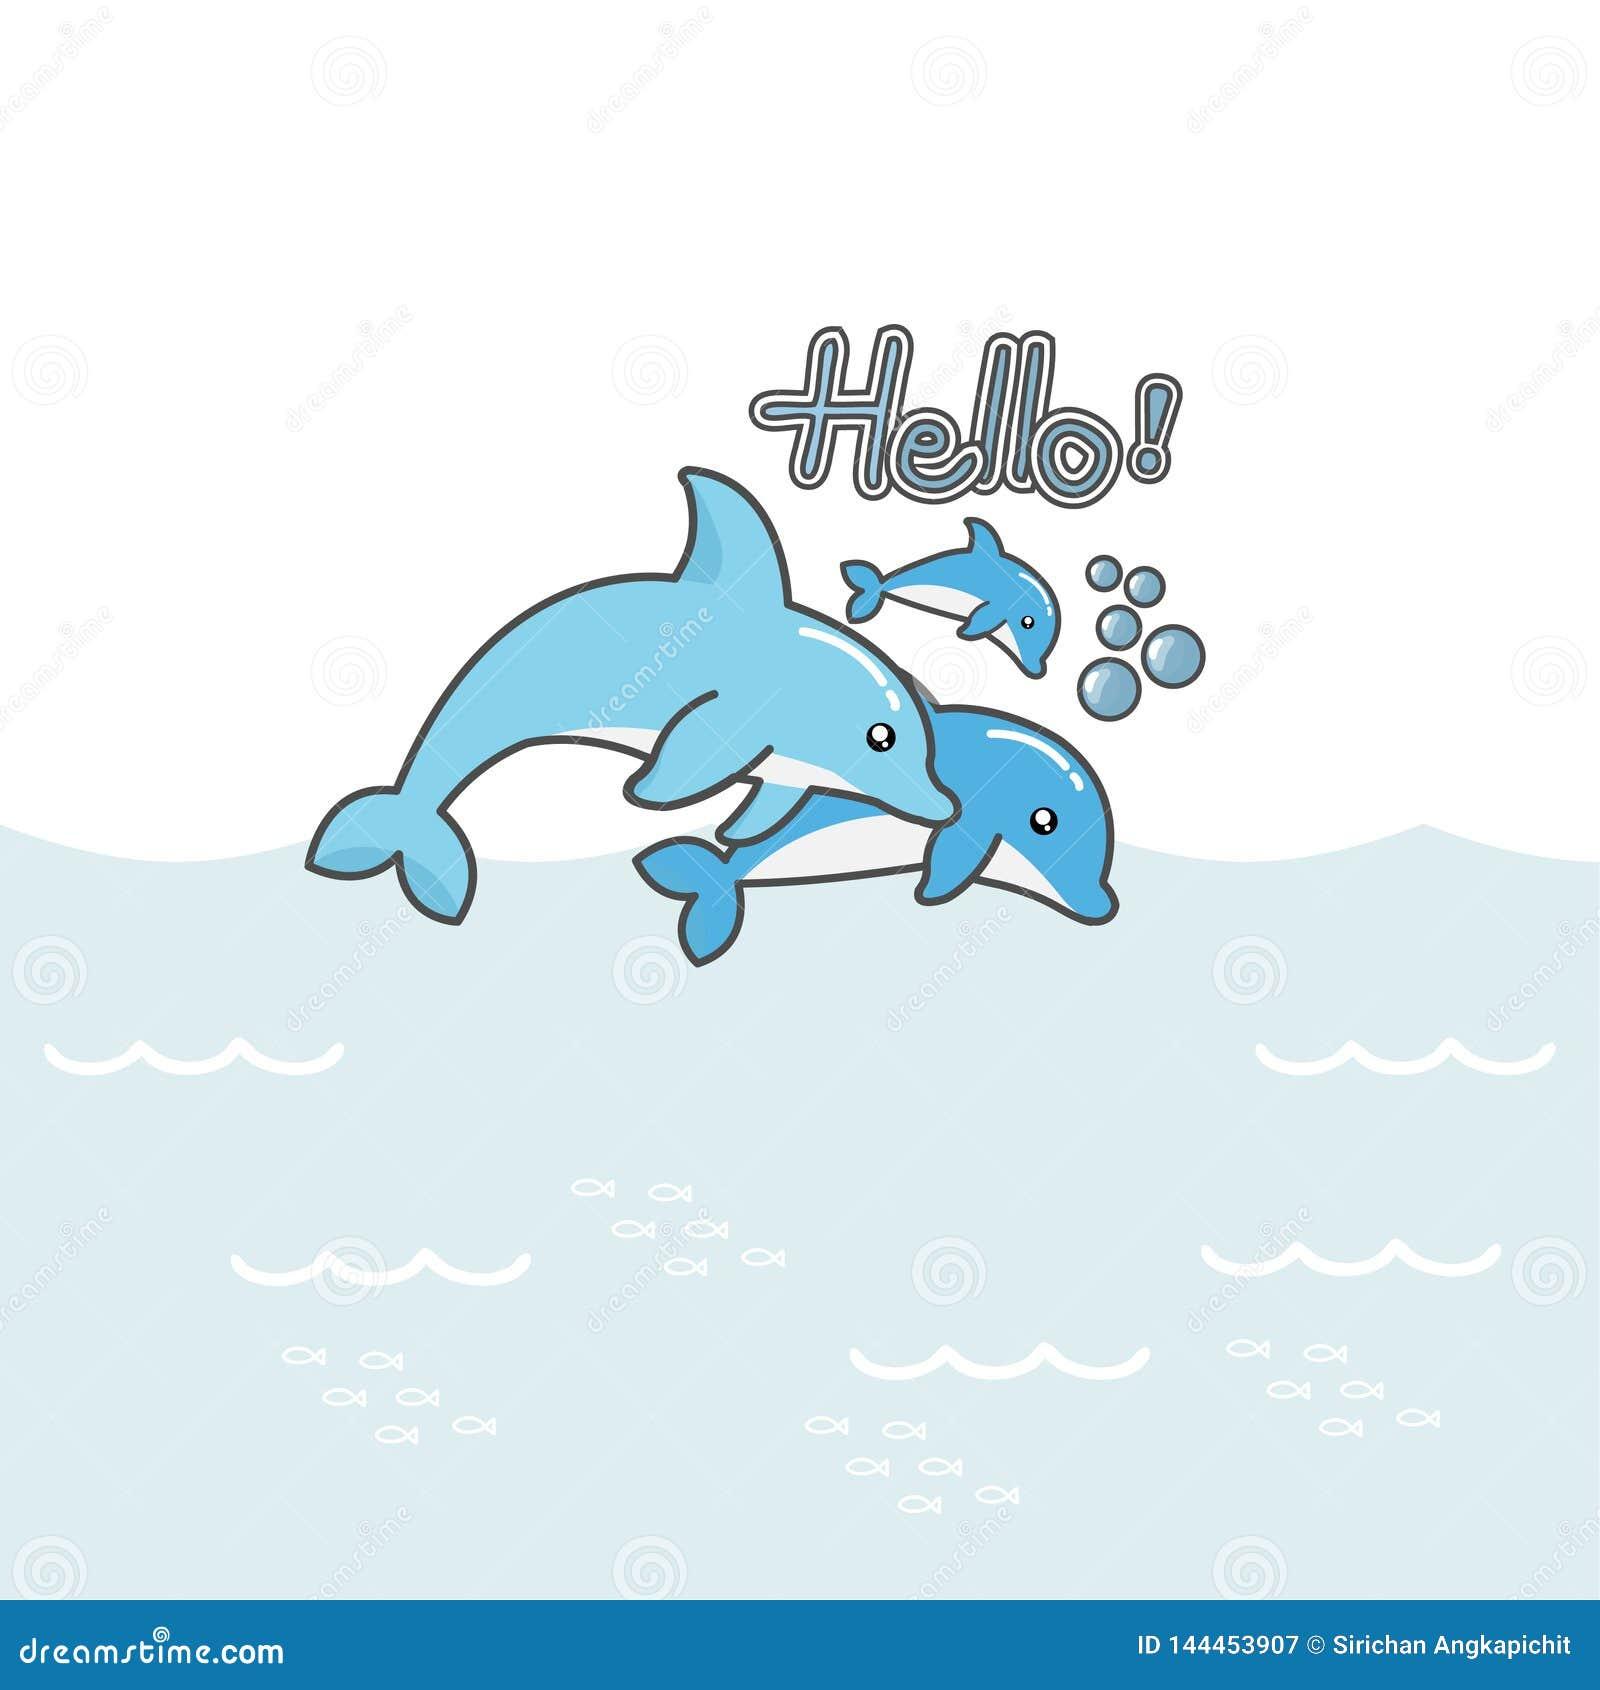 De leuke dolfijnen zeggen Hello!